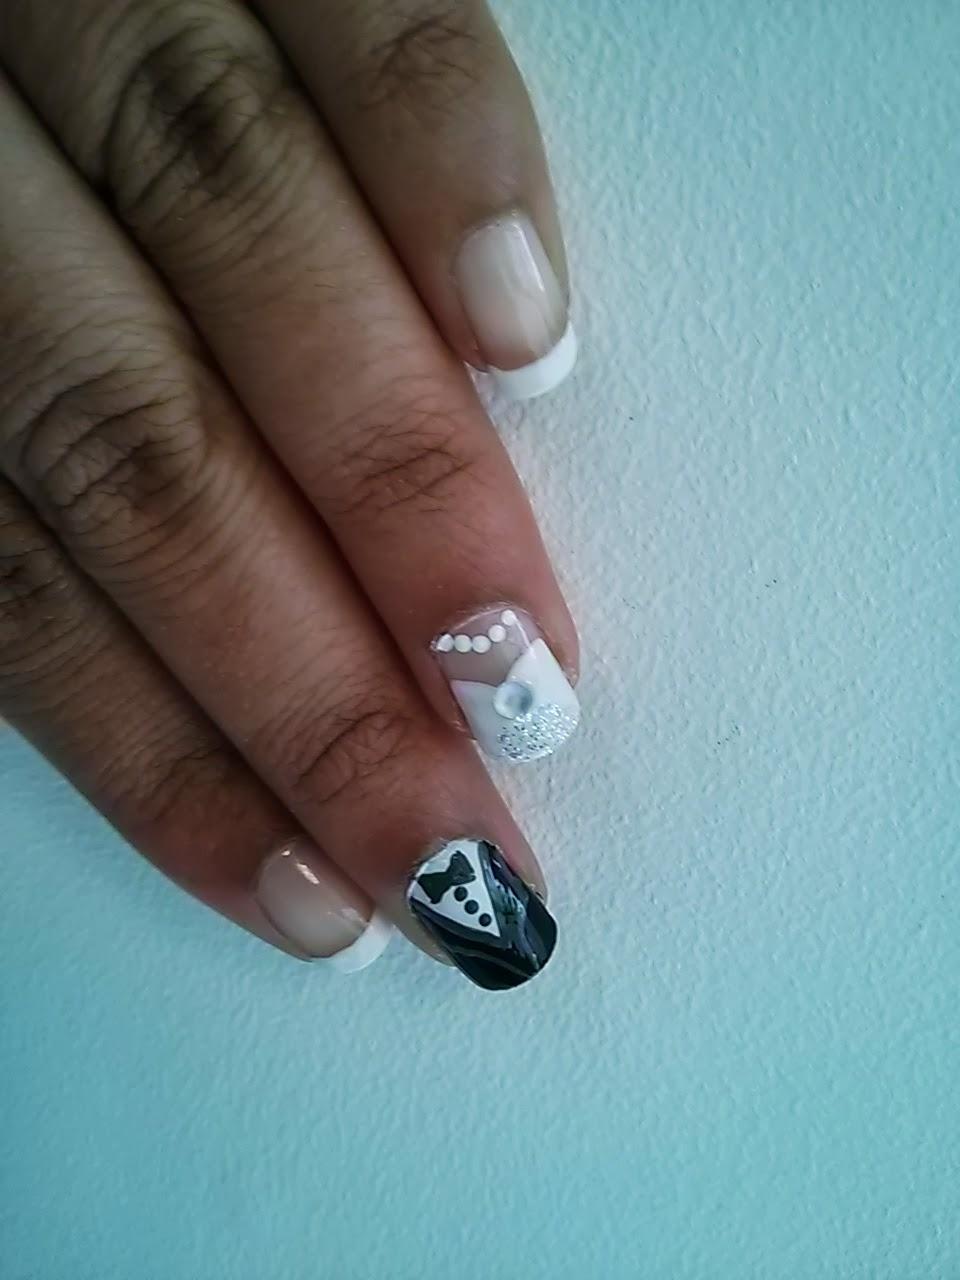 Bride & Groom Wedding Nails | Nail Art by Lena